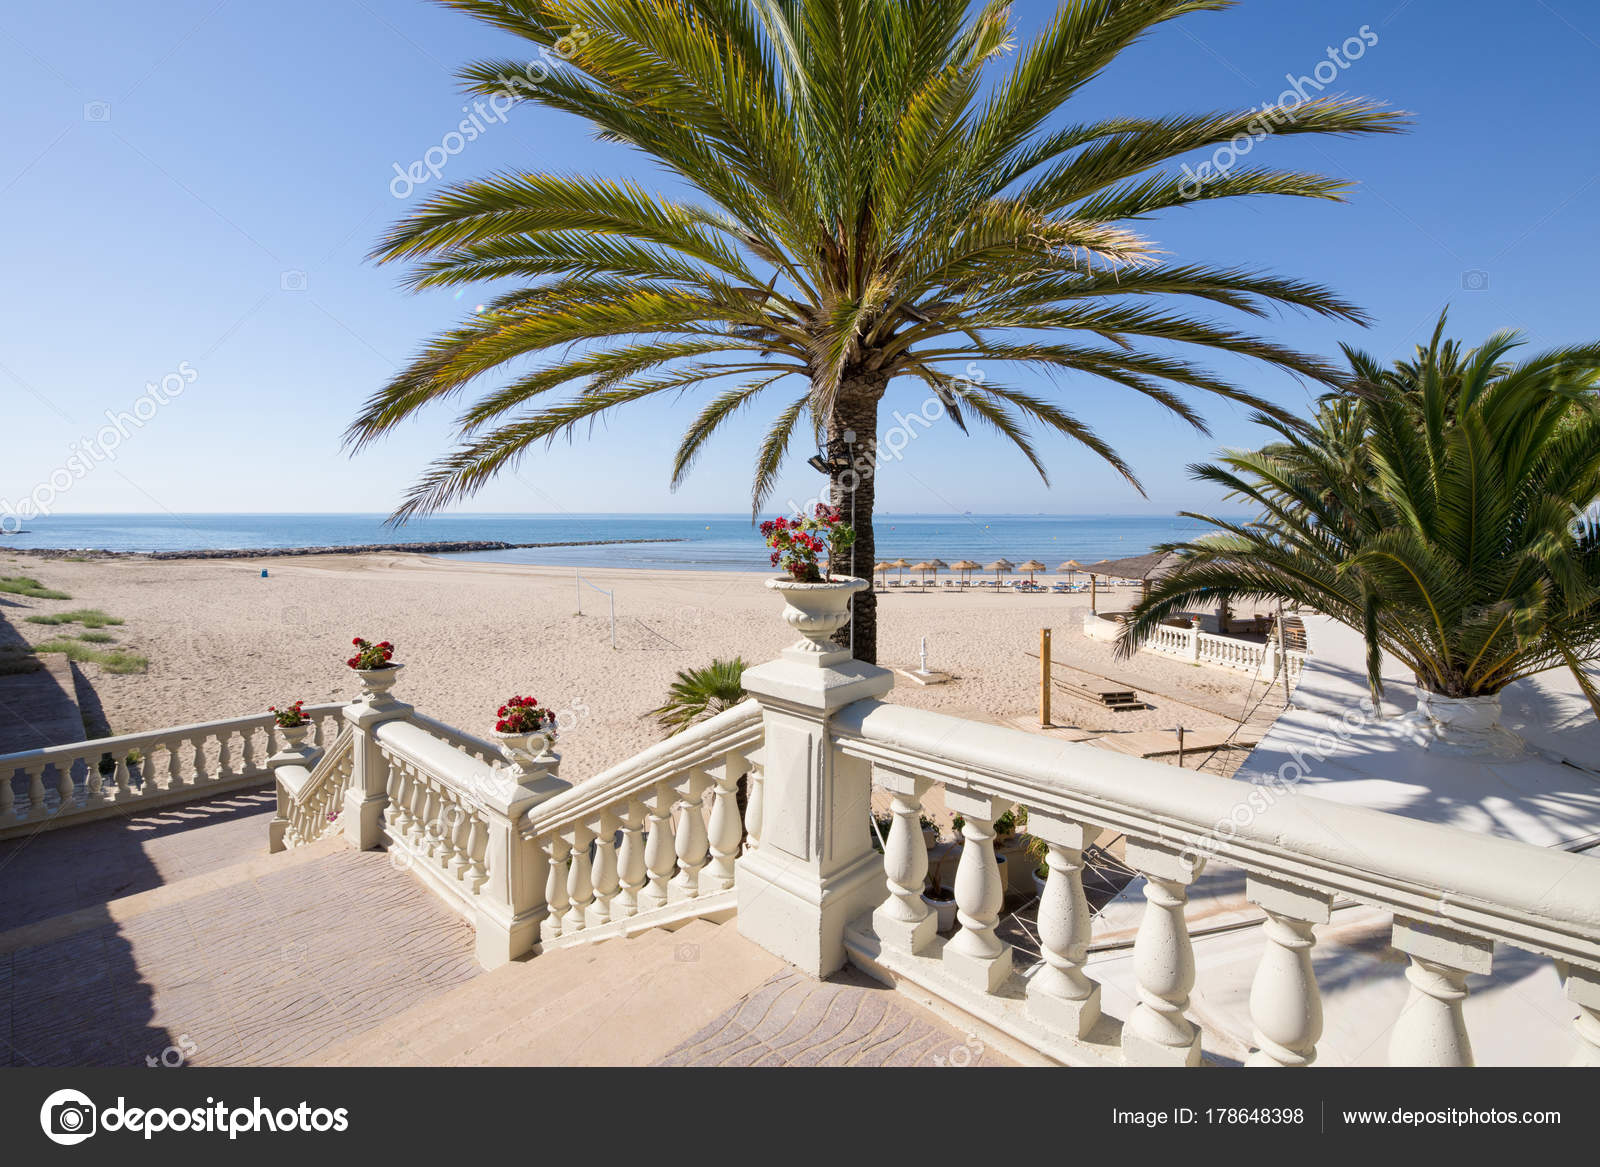 Toegang tot benicassim strand met palmbomen en trap horizontale